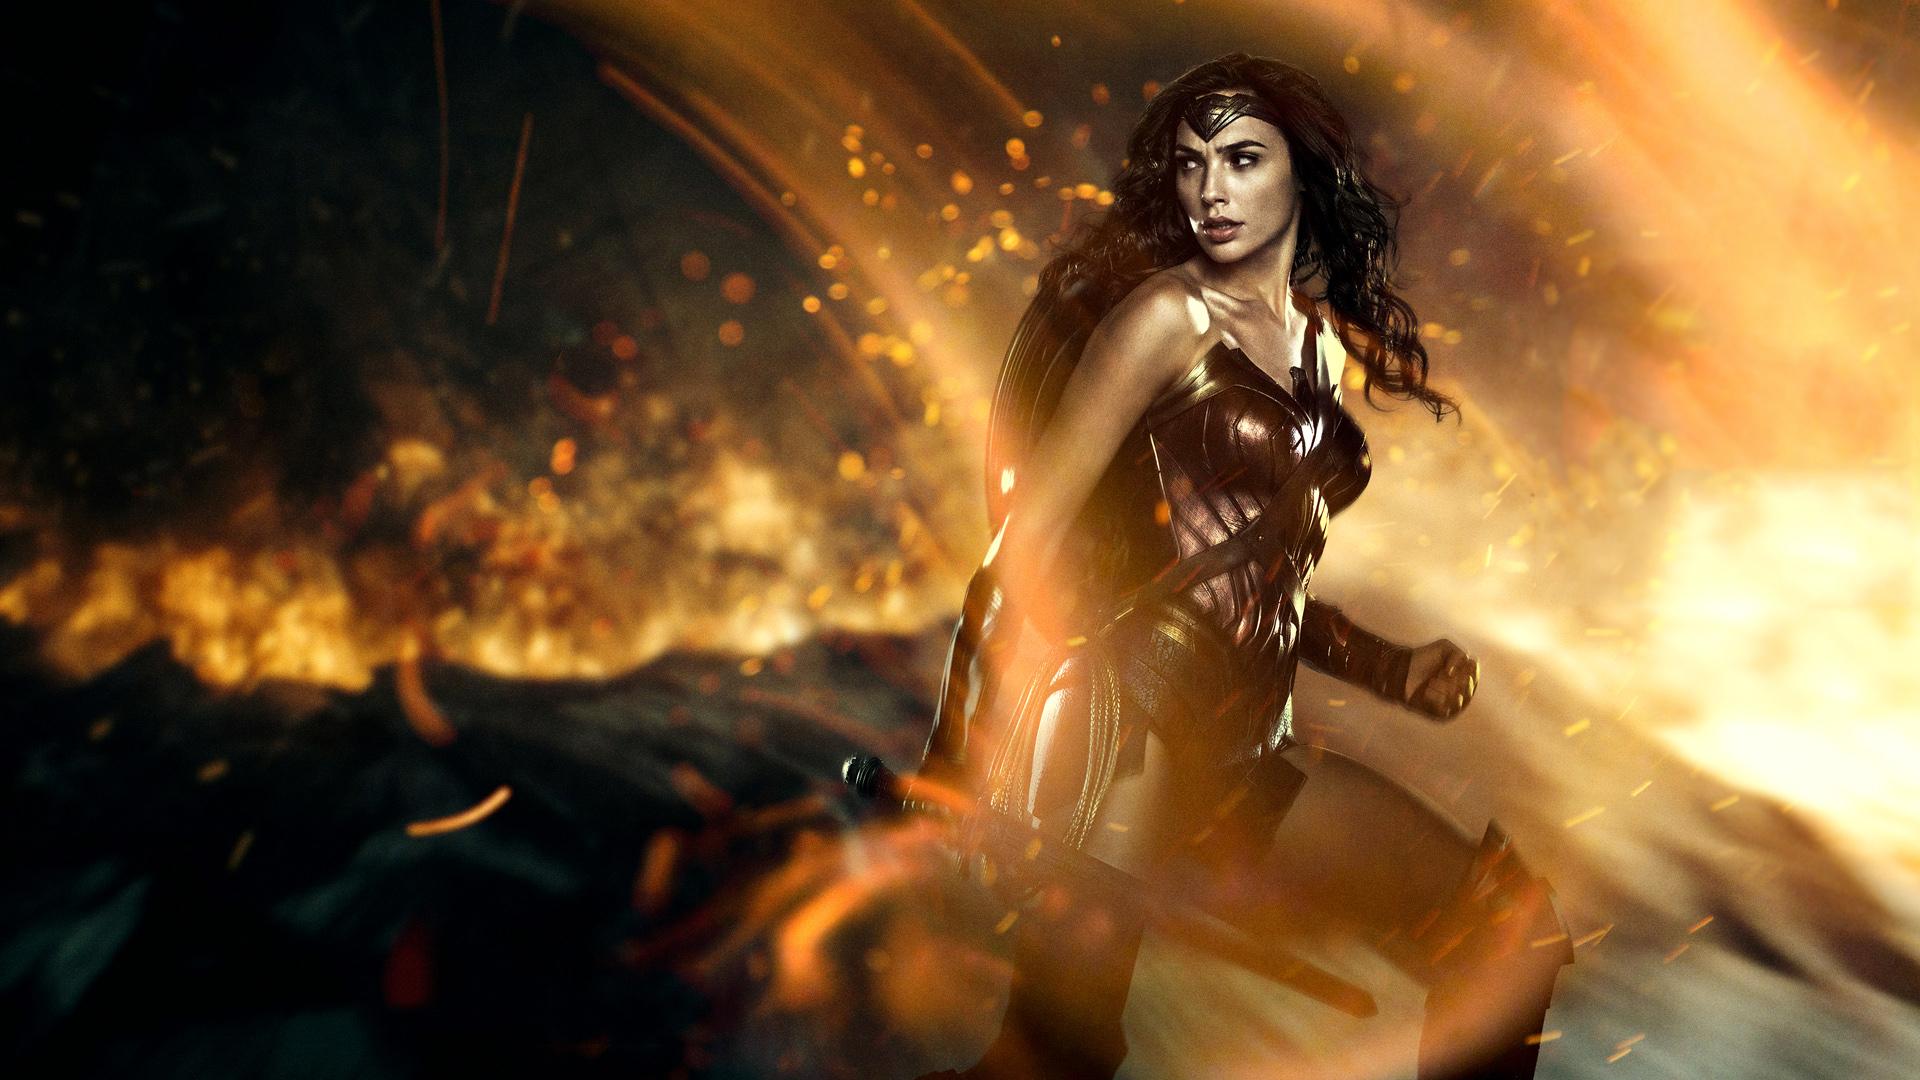 1360x768 Wonder Woman 2 Laptop Hd Hd 4k Wallpapers Images